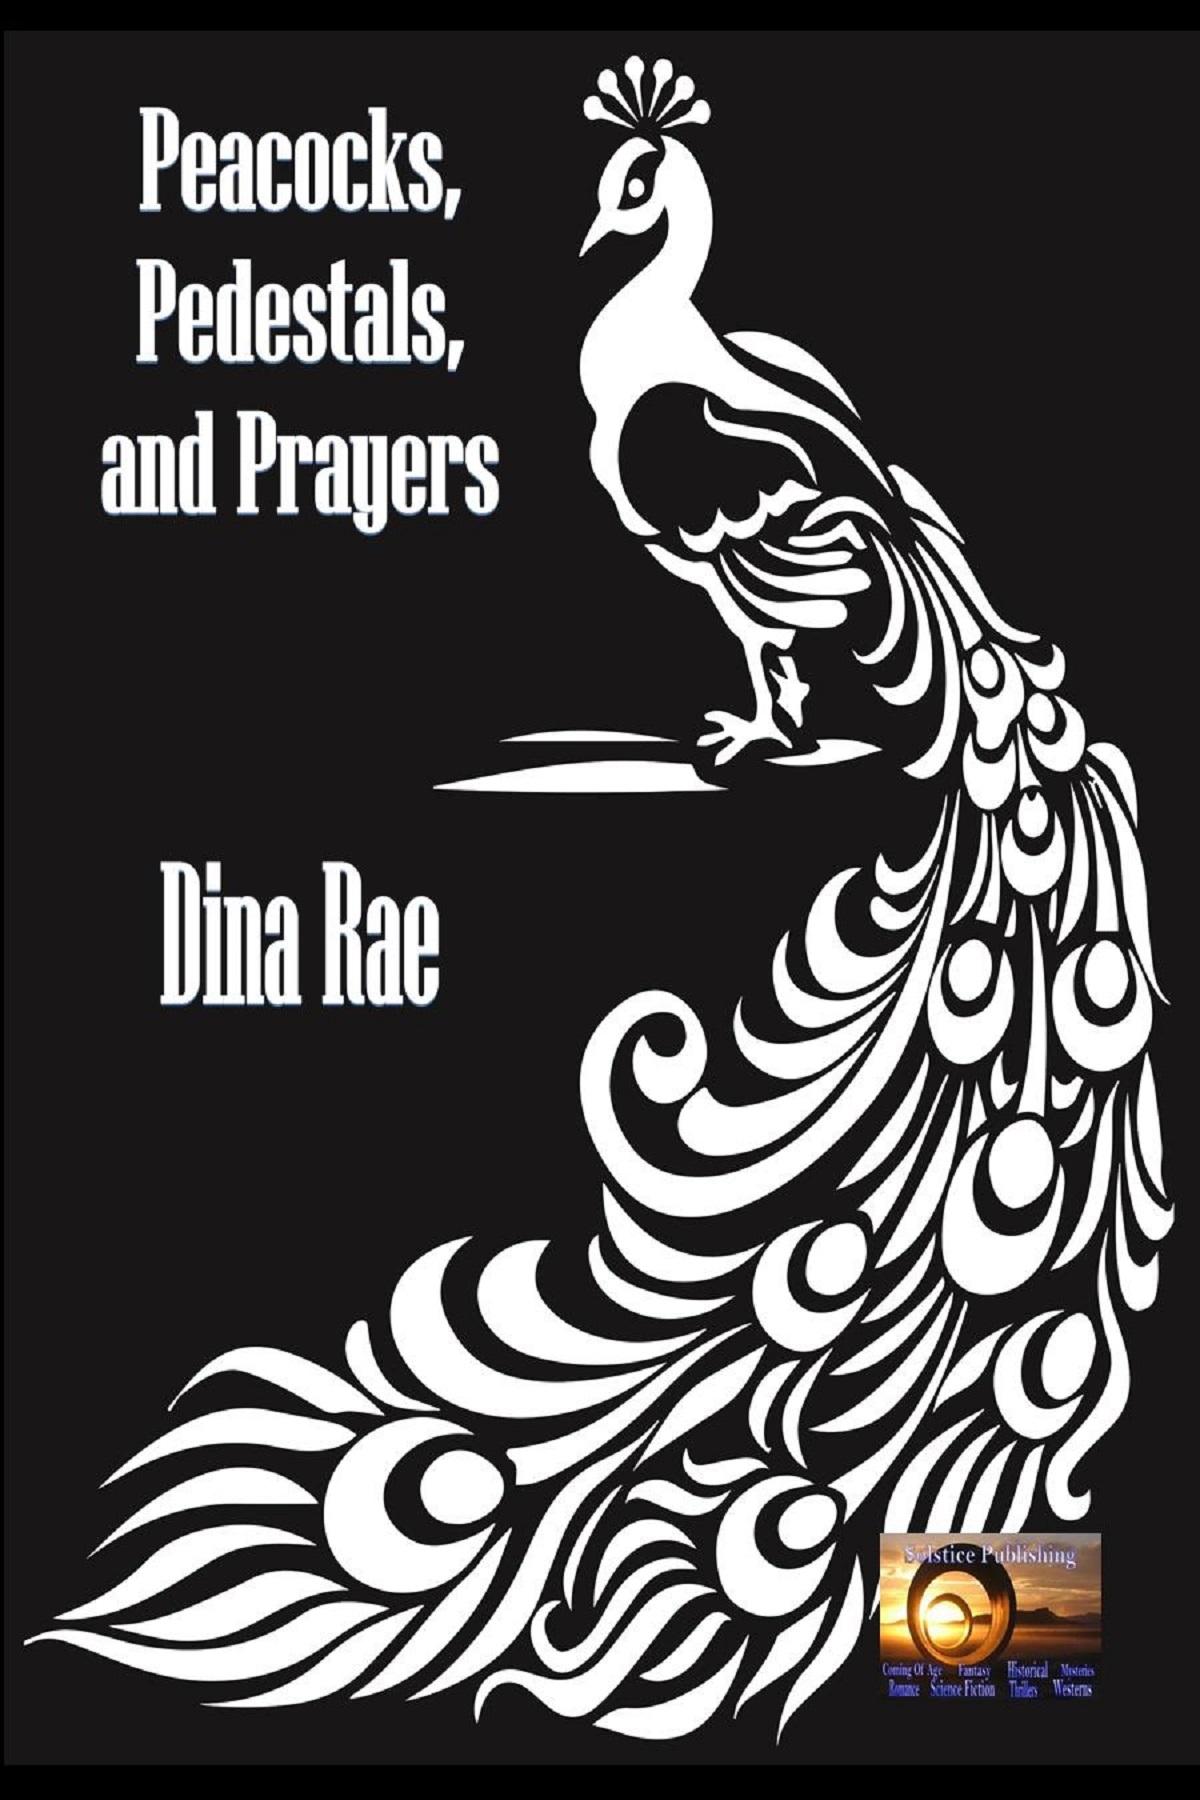 Peacocks, Pedestals and Prayers cover